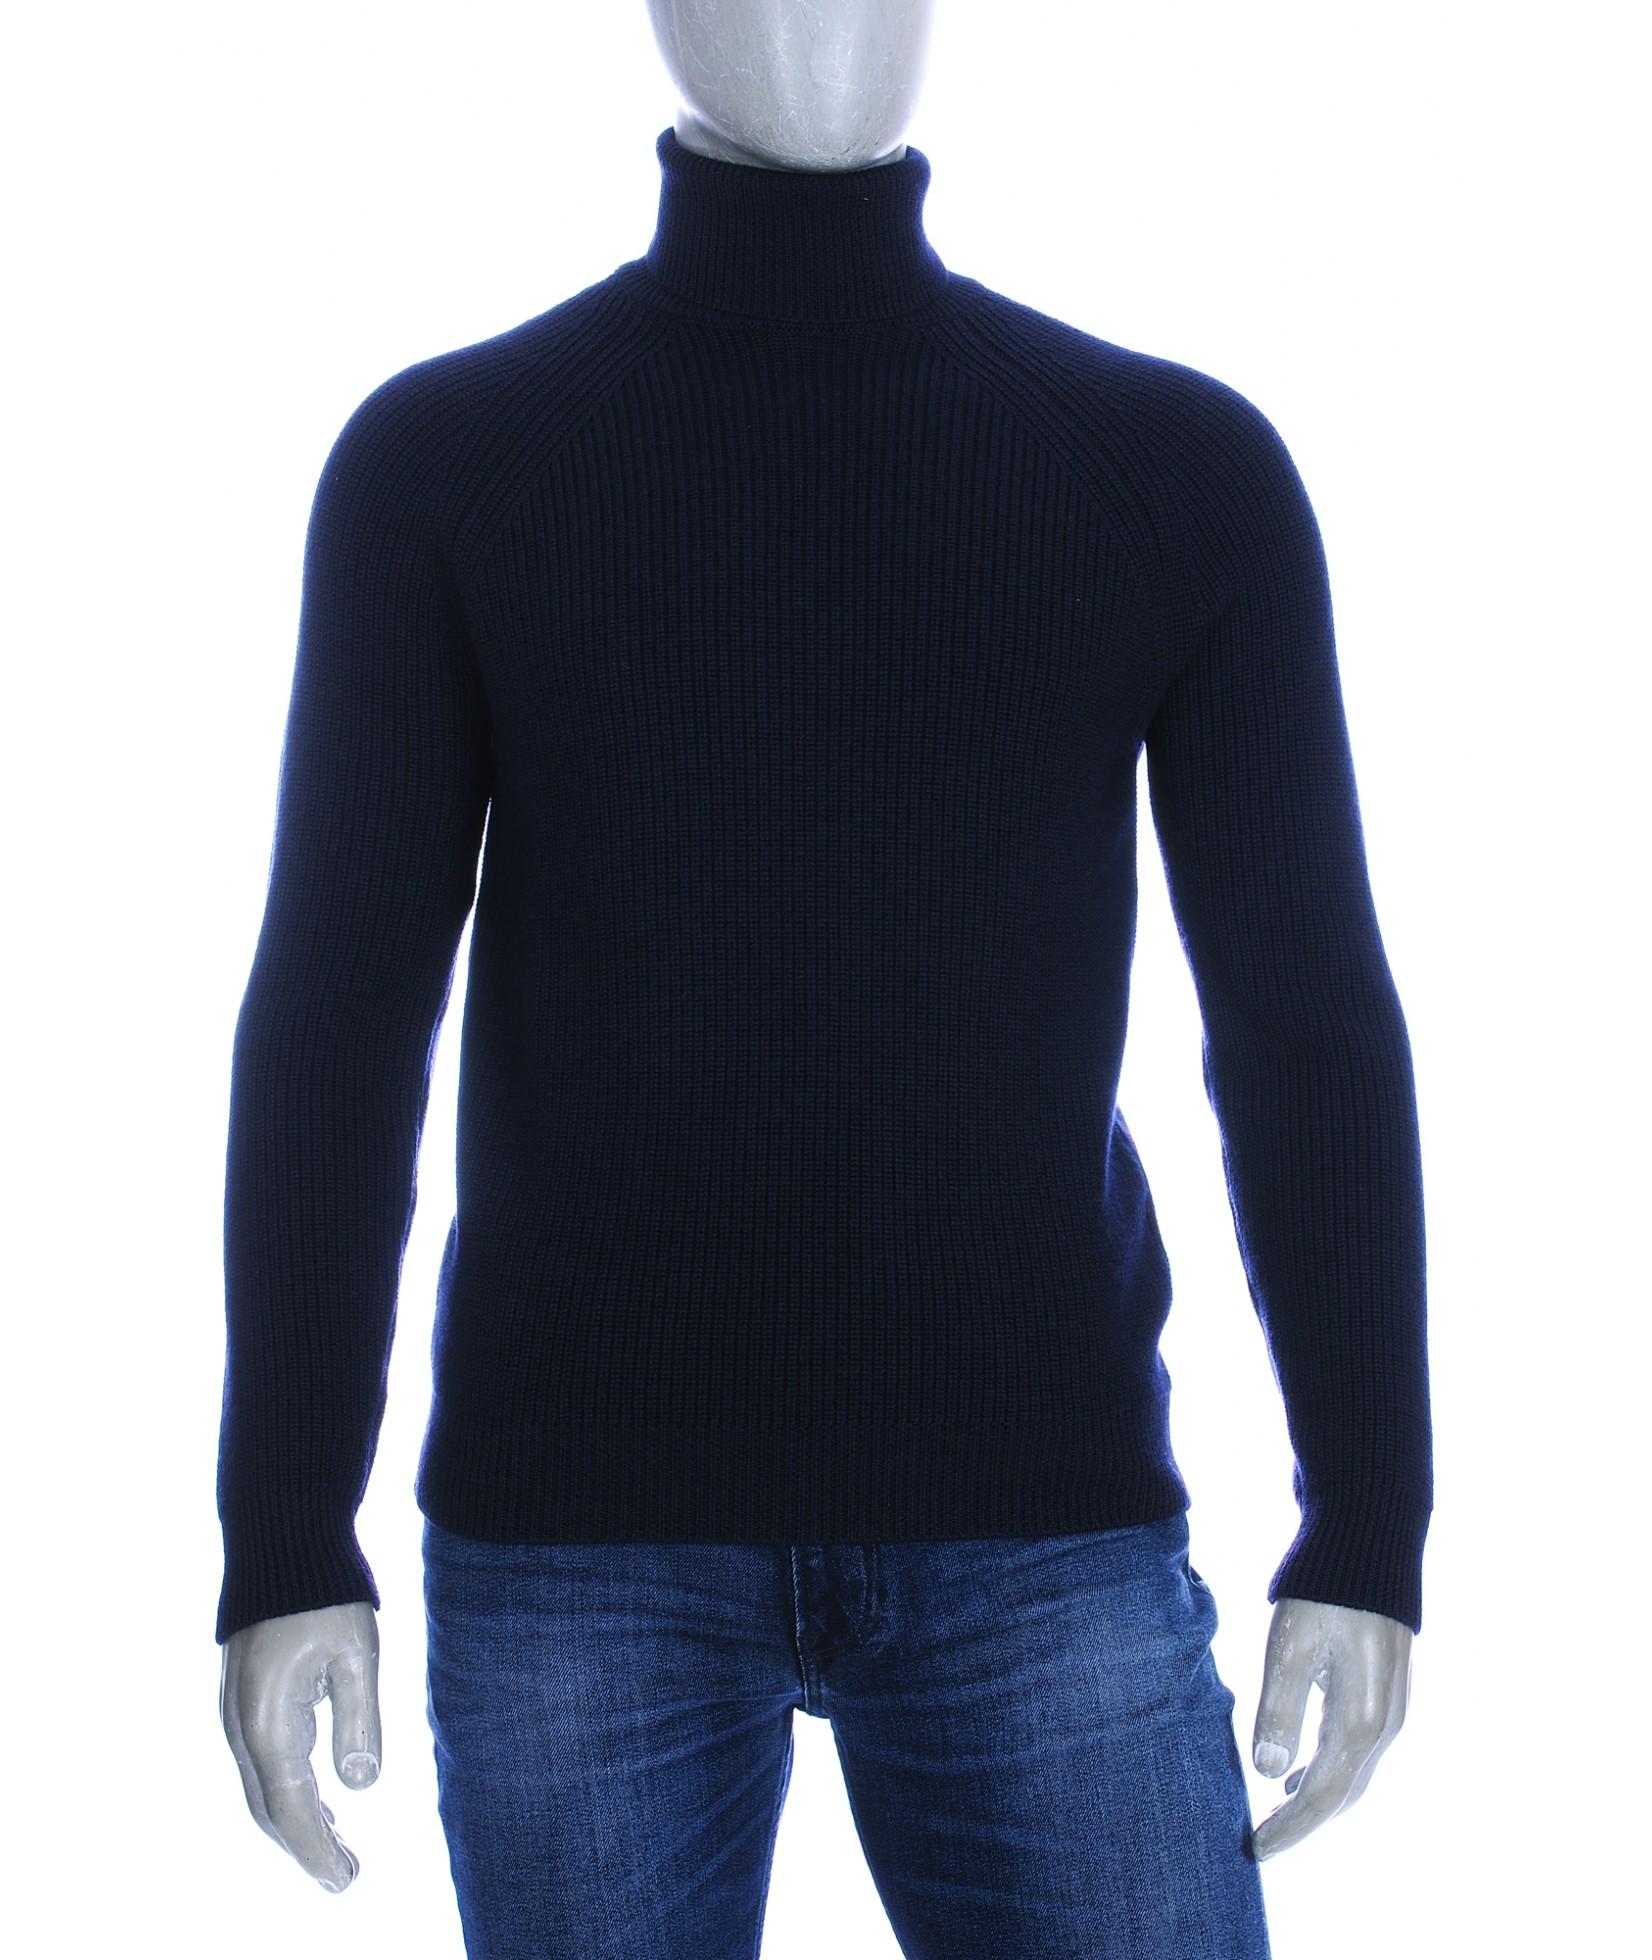 Jacob Cohën sweater donkerblauw (34839)